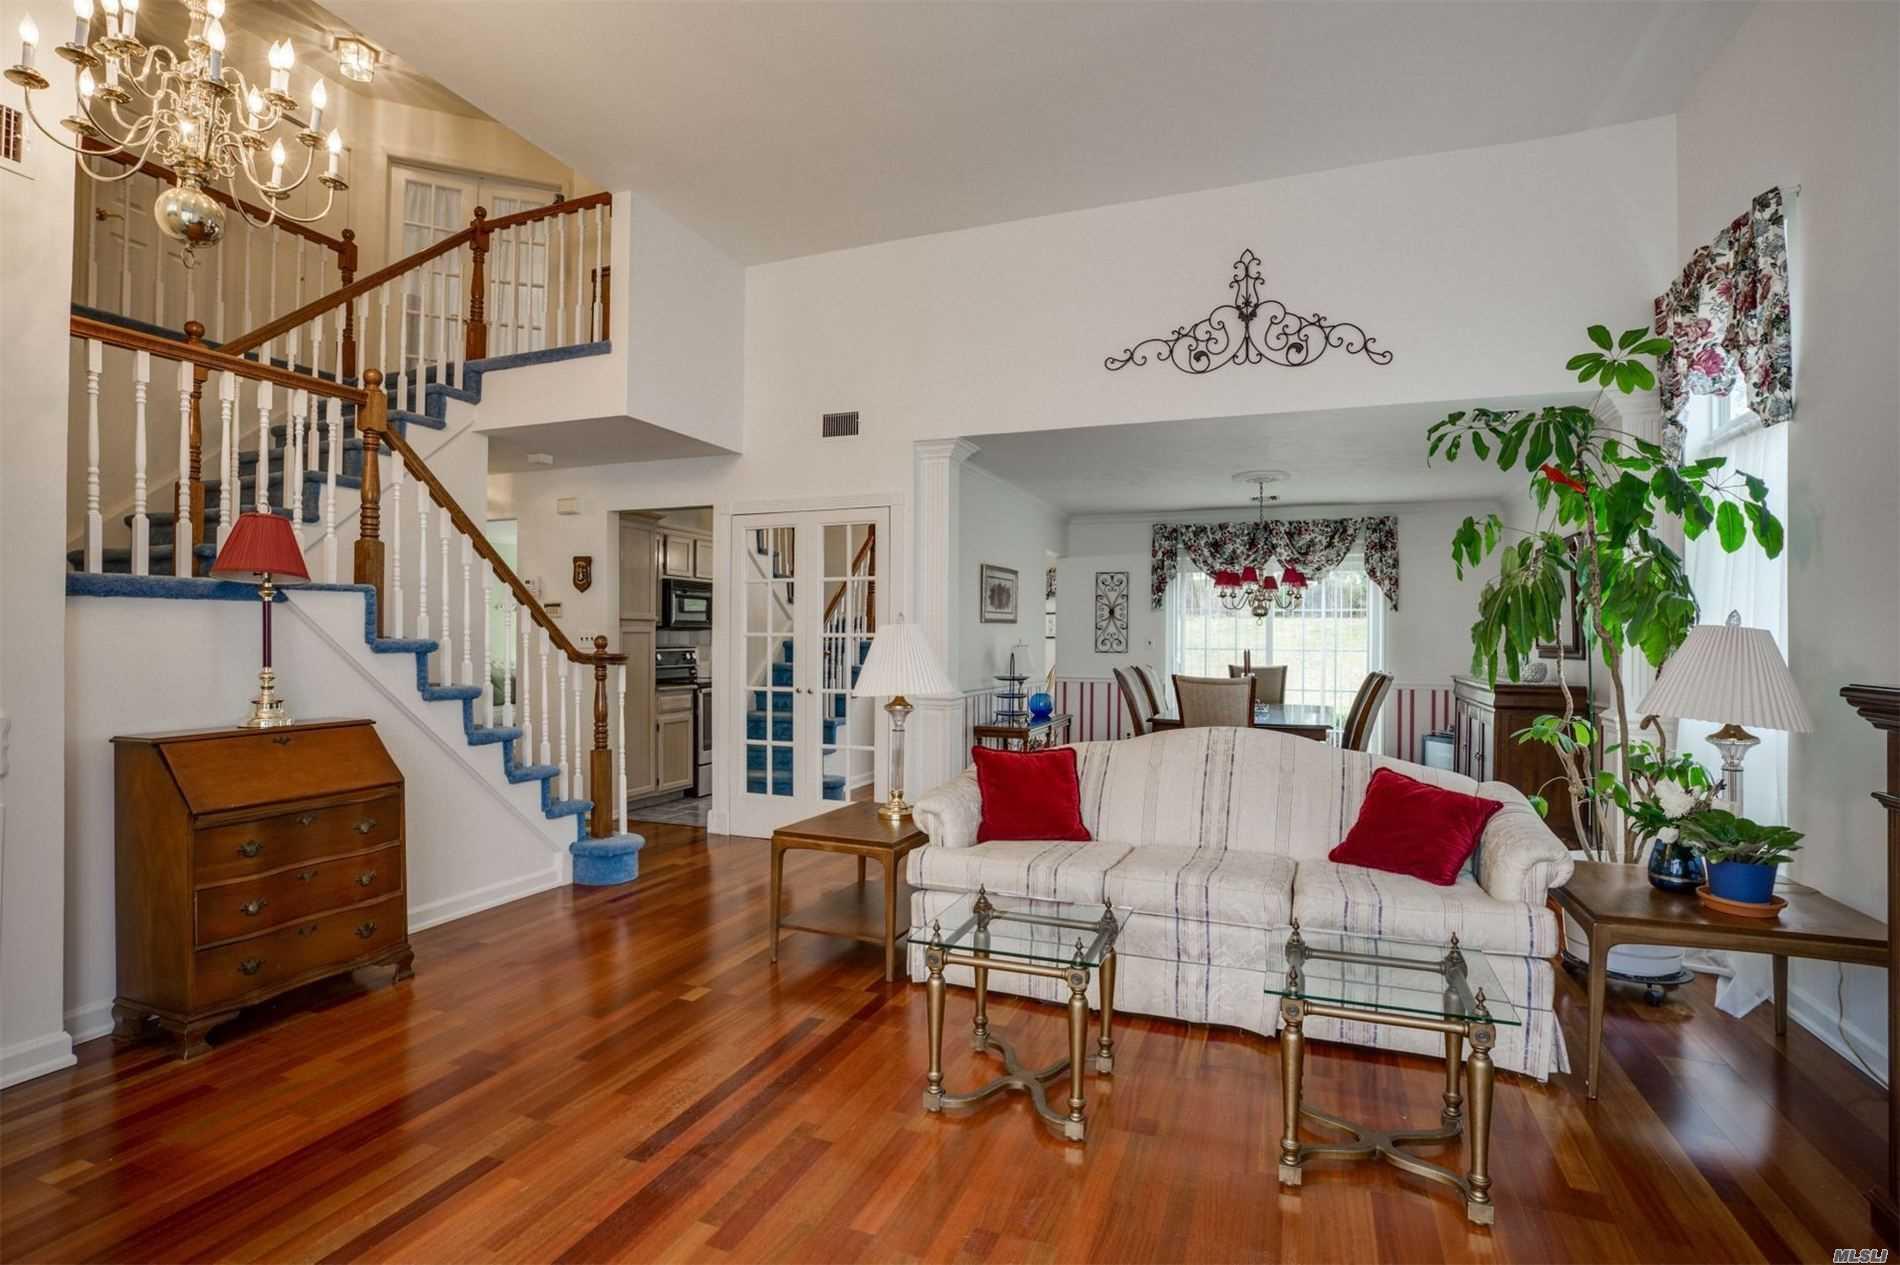 Property for sale at 6 Colony Drive, Holbrook NY 11741, Holbrook,  New York 11741